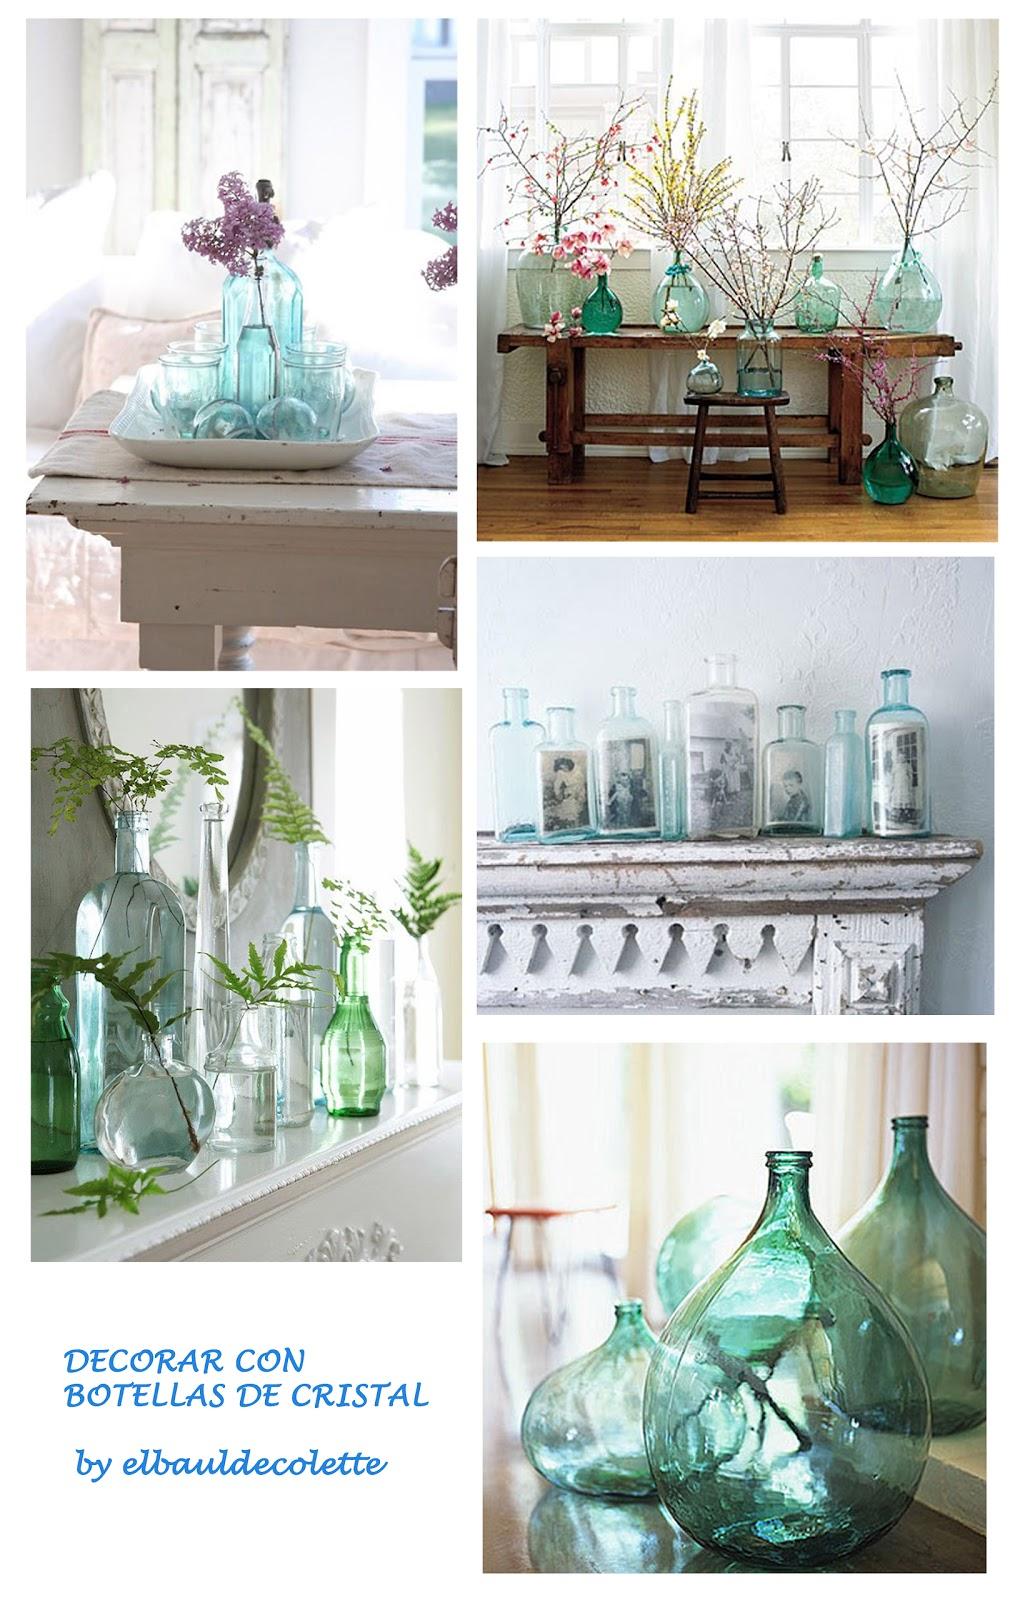 Idea and blog decorar con botellas de cristal - Decorar botellas de cristal ...